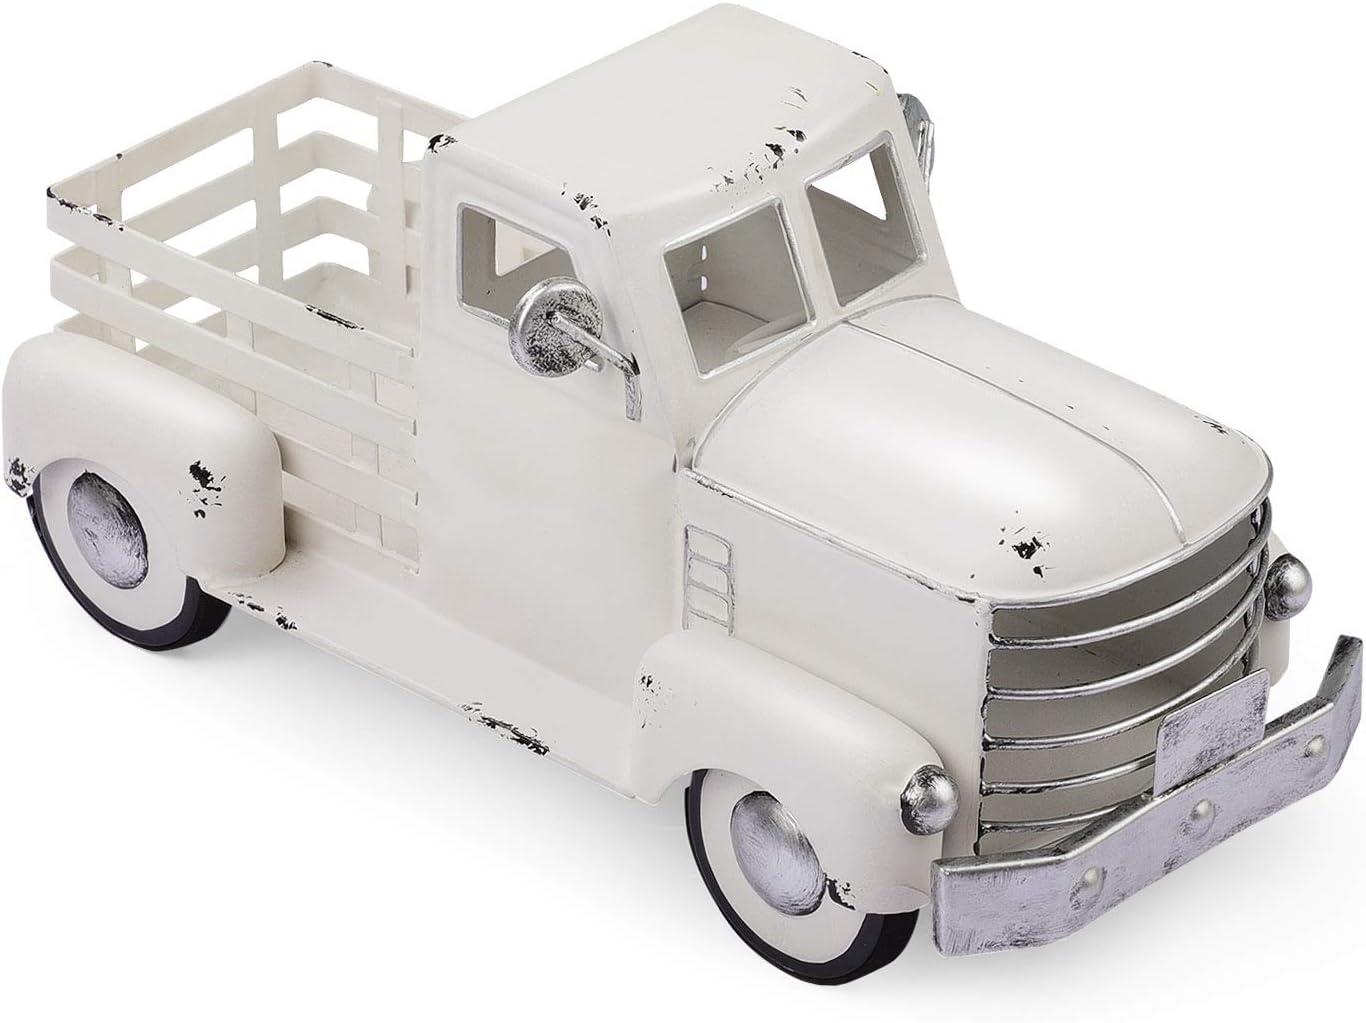 Vintage White Truck Décor, Farmhouse White Truck Spring Decoration, Decorative Tabletop Storage & Pick-up Metal Truck Planter